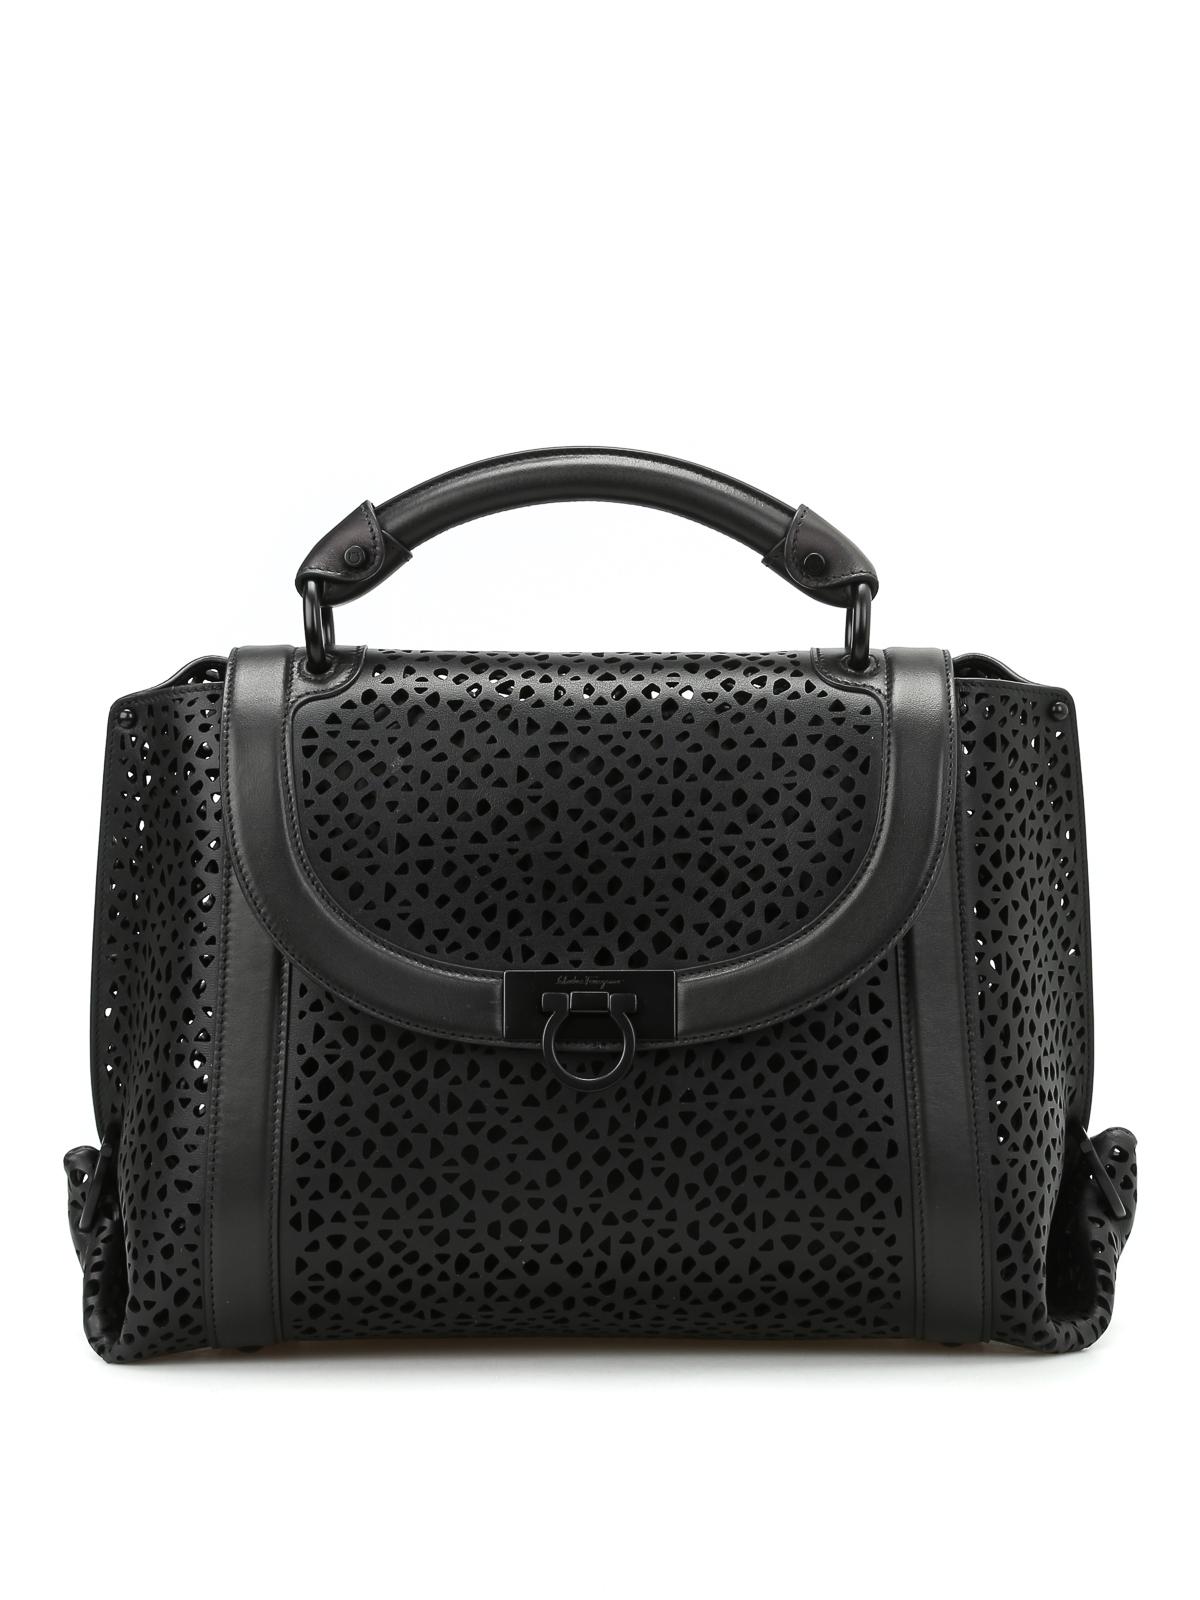 6783f9342a36 ... SALVATORE FERRAGAMO bowling bags - Soft Sofia laser cut medium handbag  reputable site 61bb4 533be ...